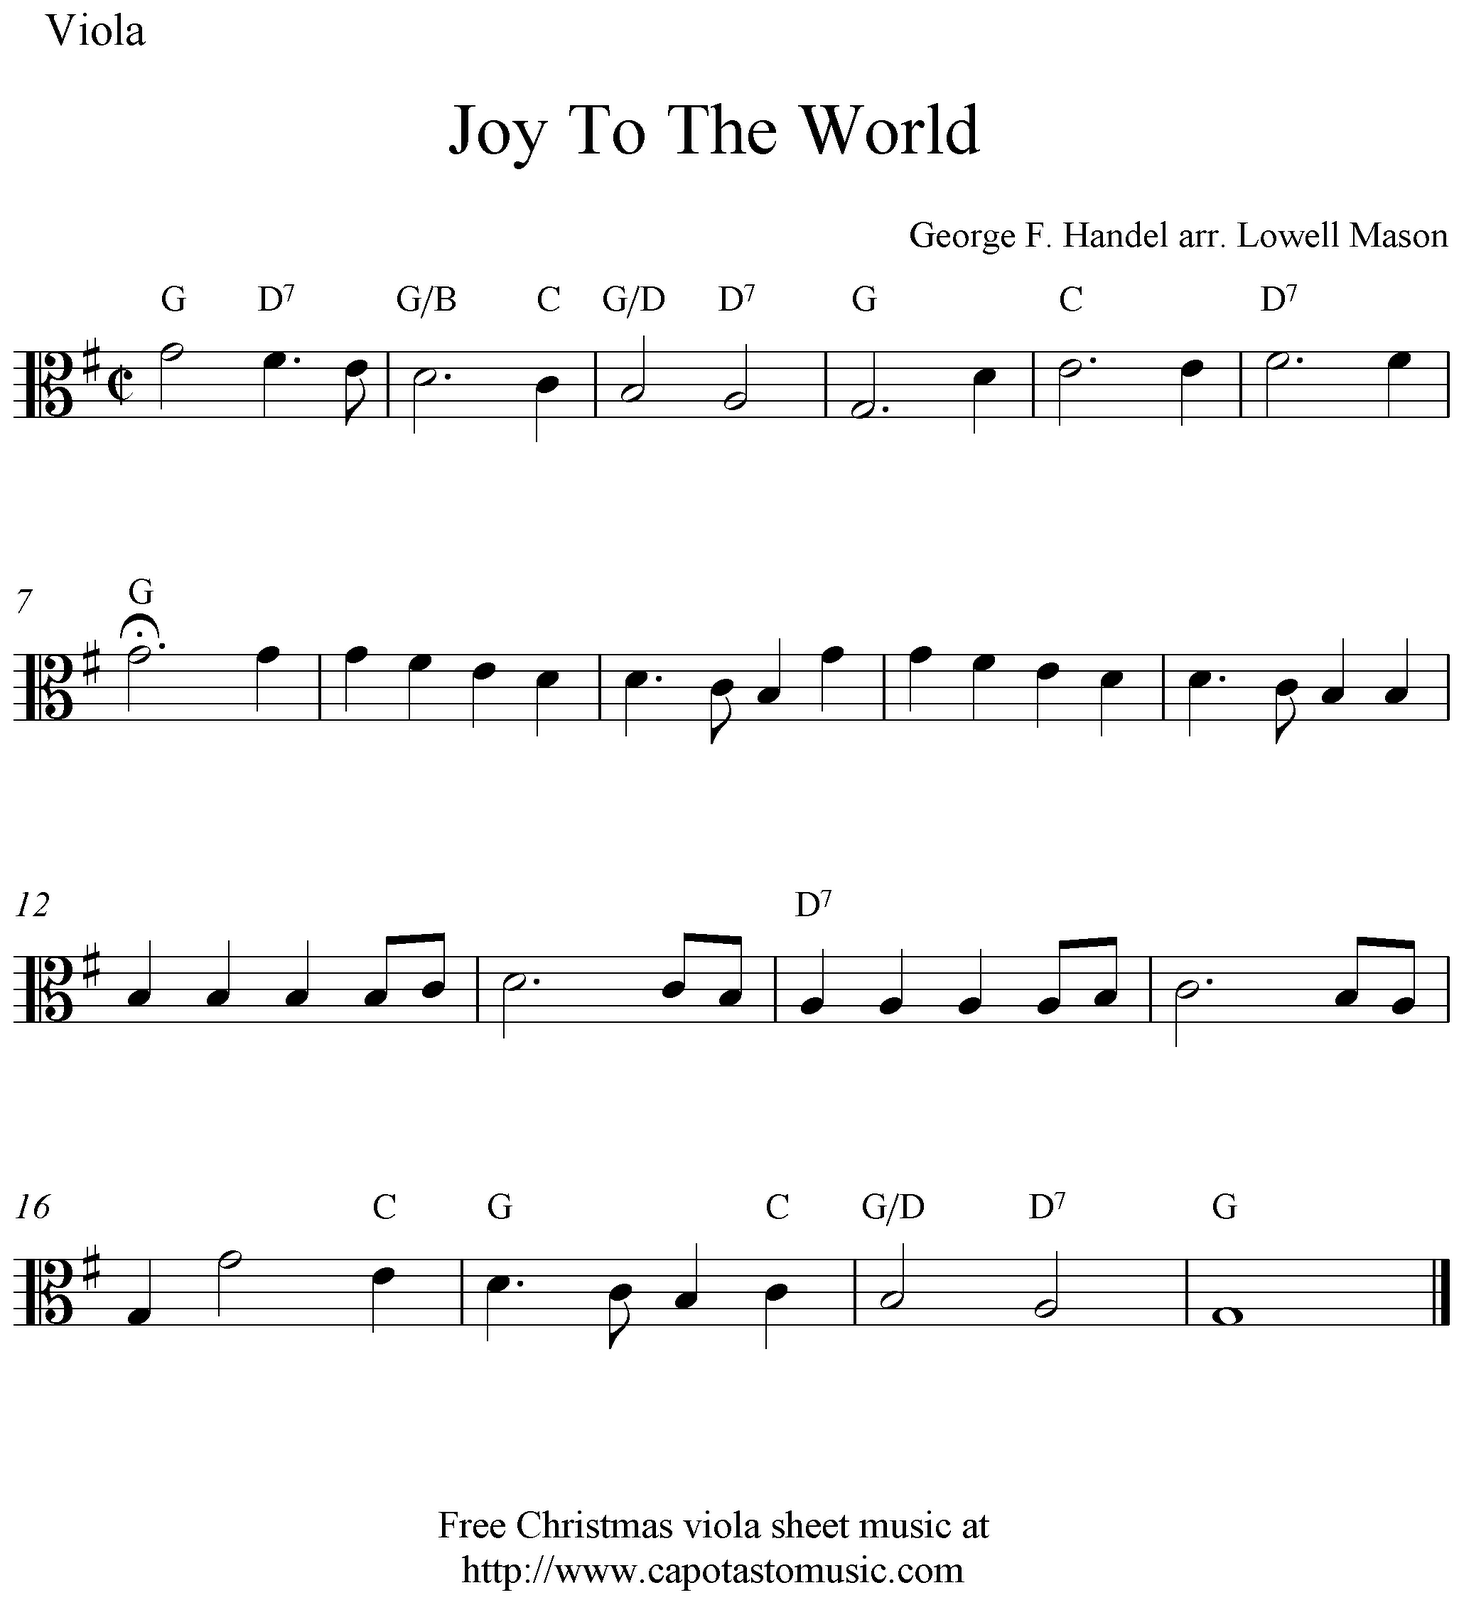 Free Christmas Guitar Sheet Music For Beginners: Viola Sheet Music For Beginners Christmas Music